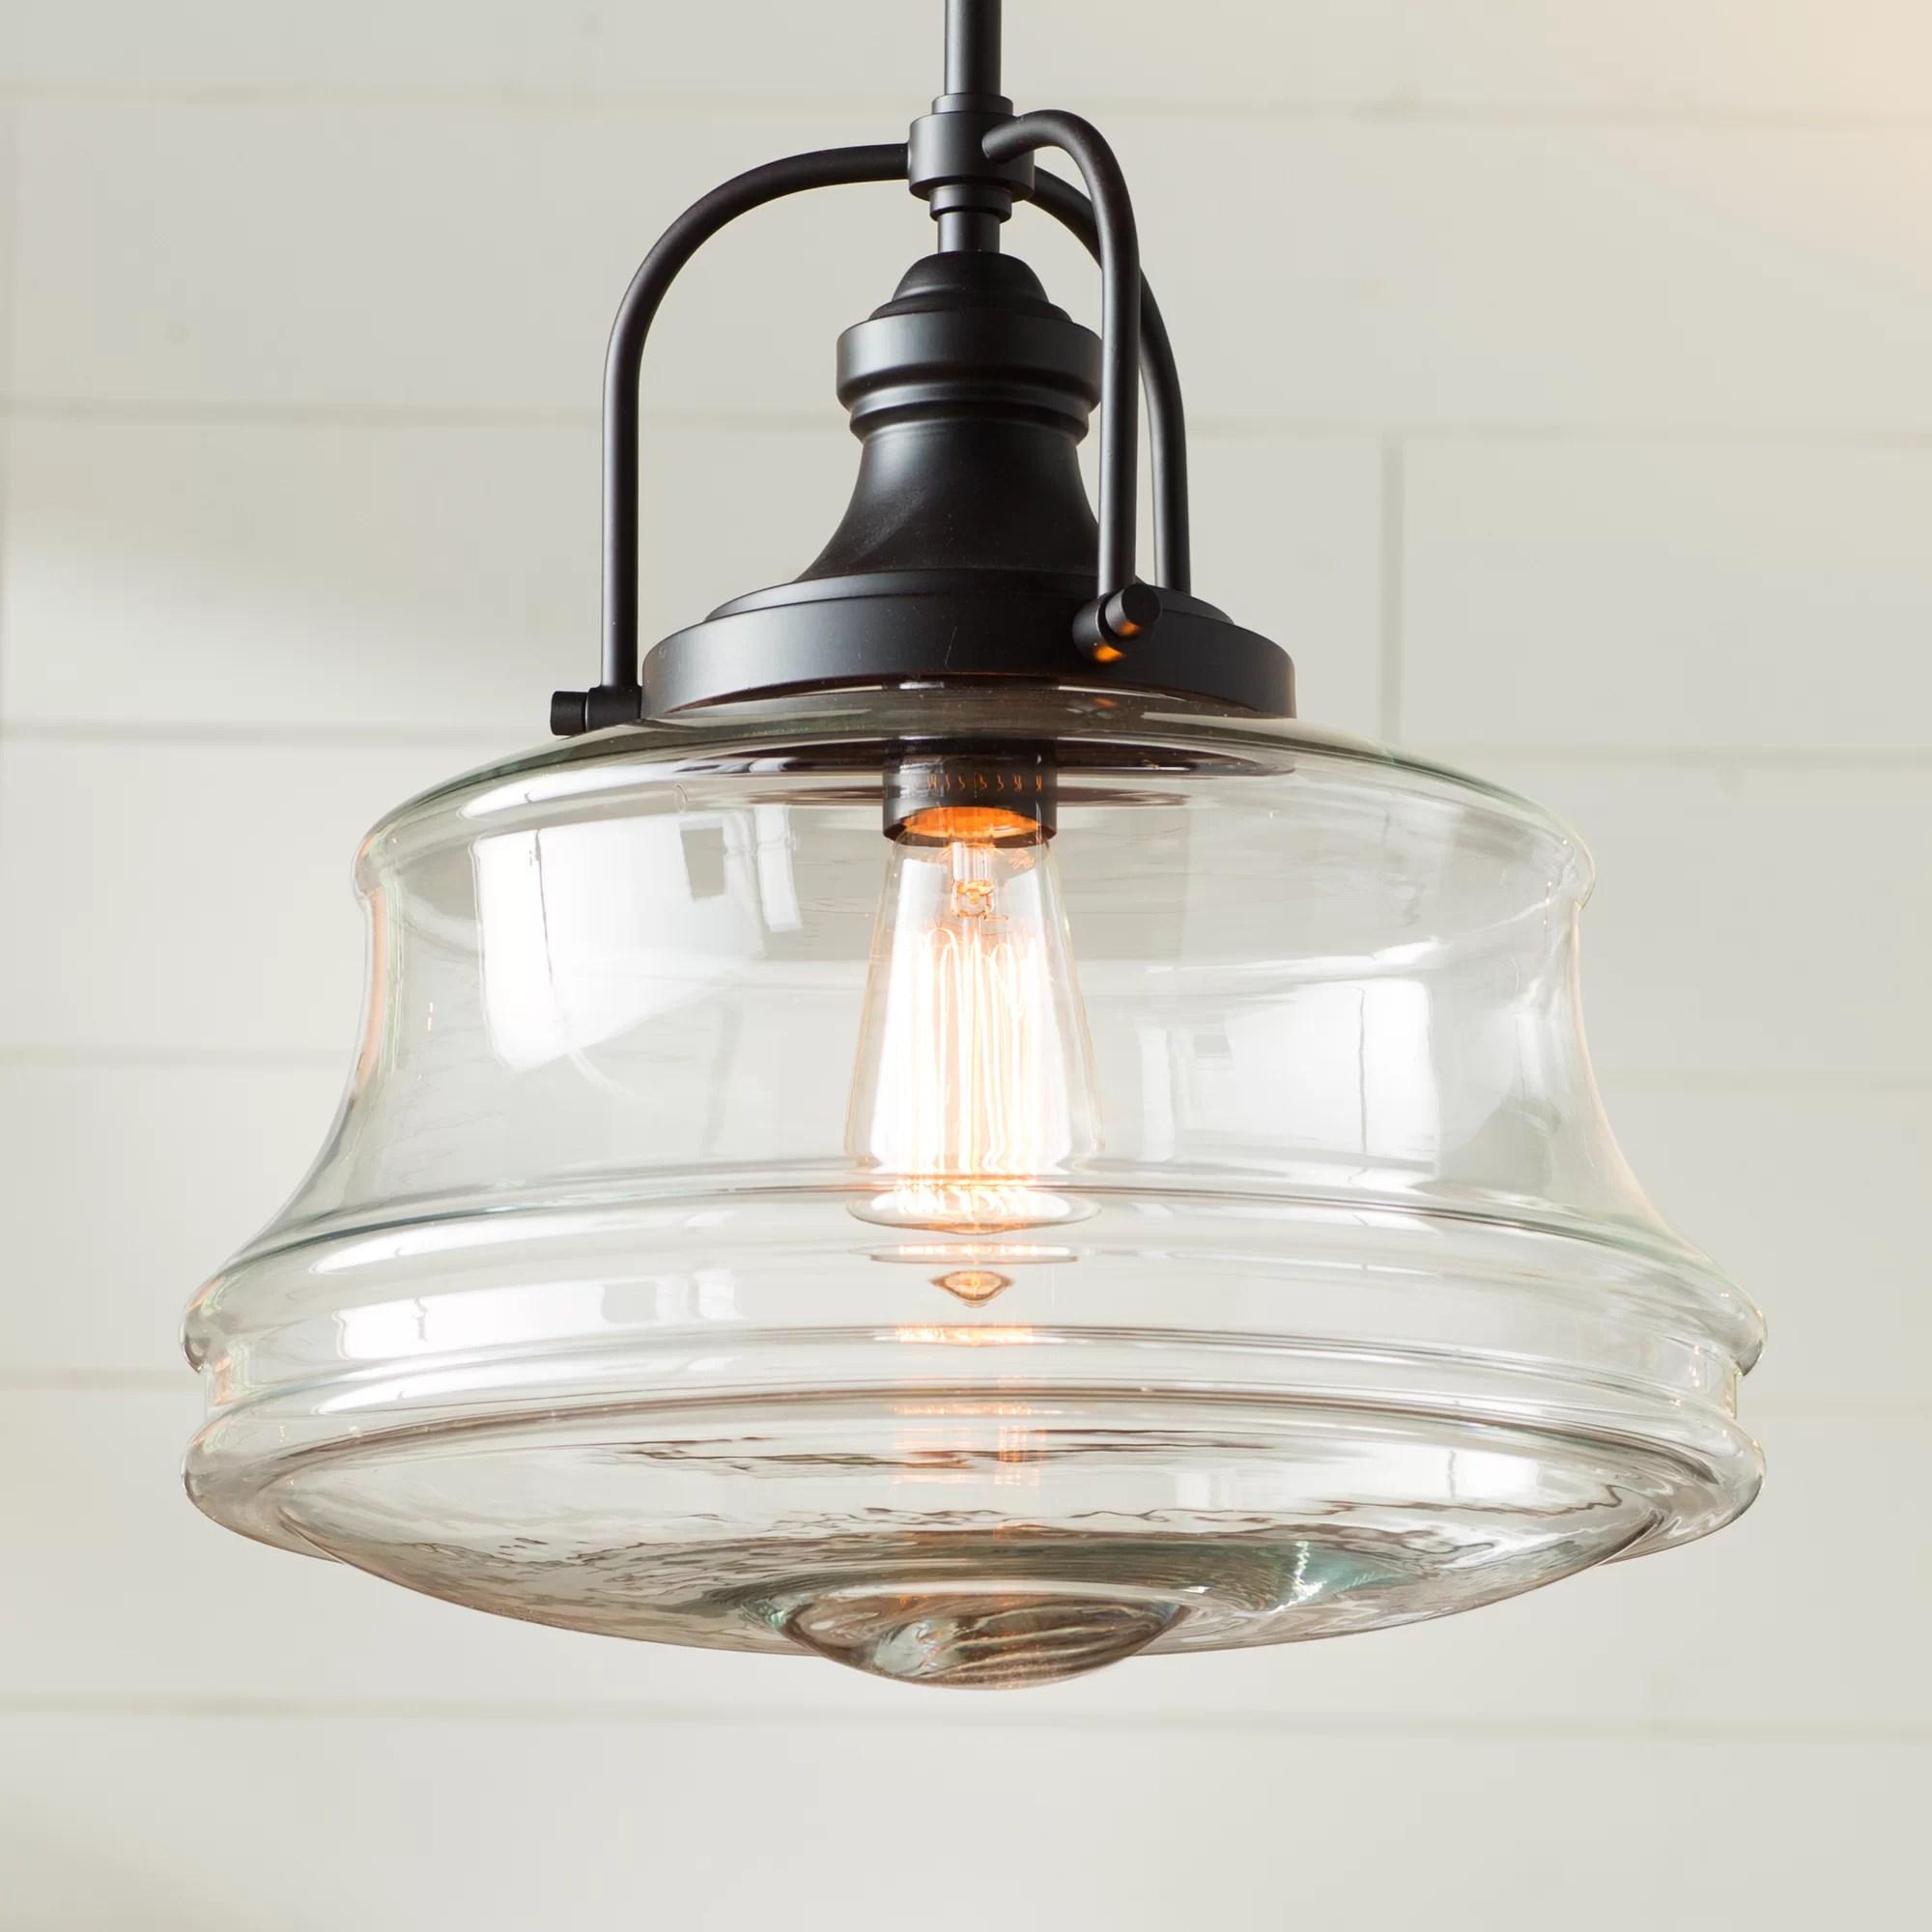 Modern Farmhouse Pendant Lighting